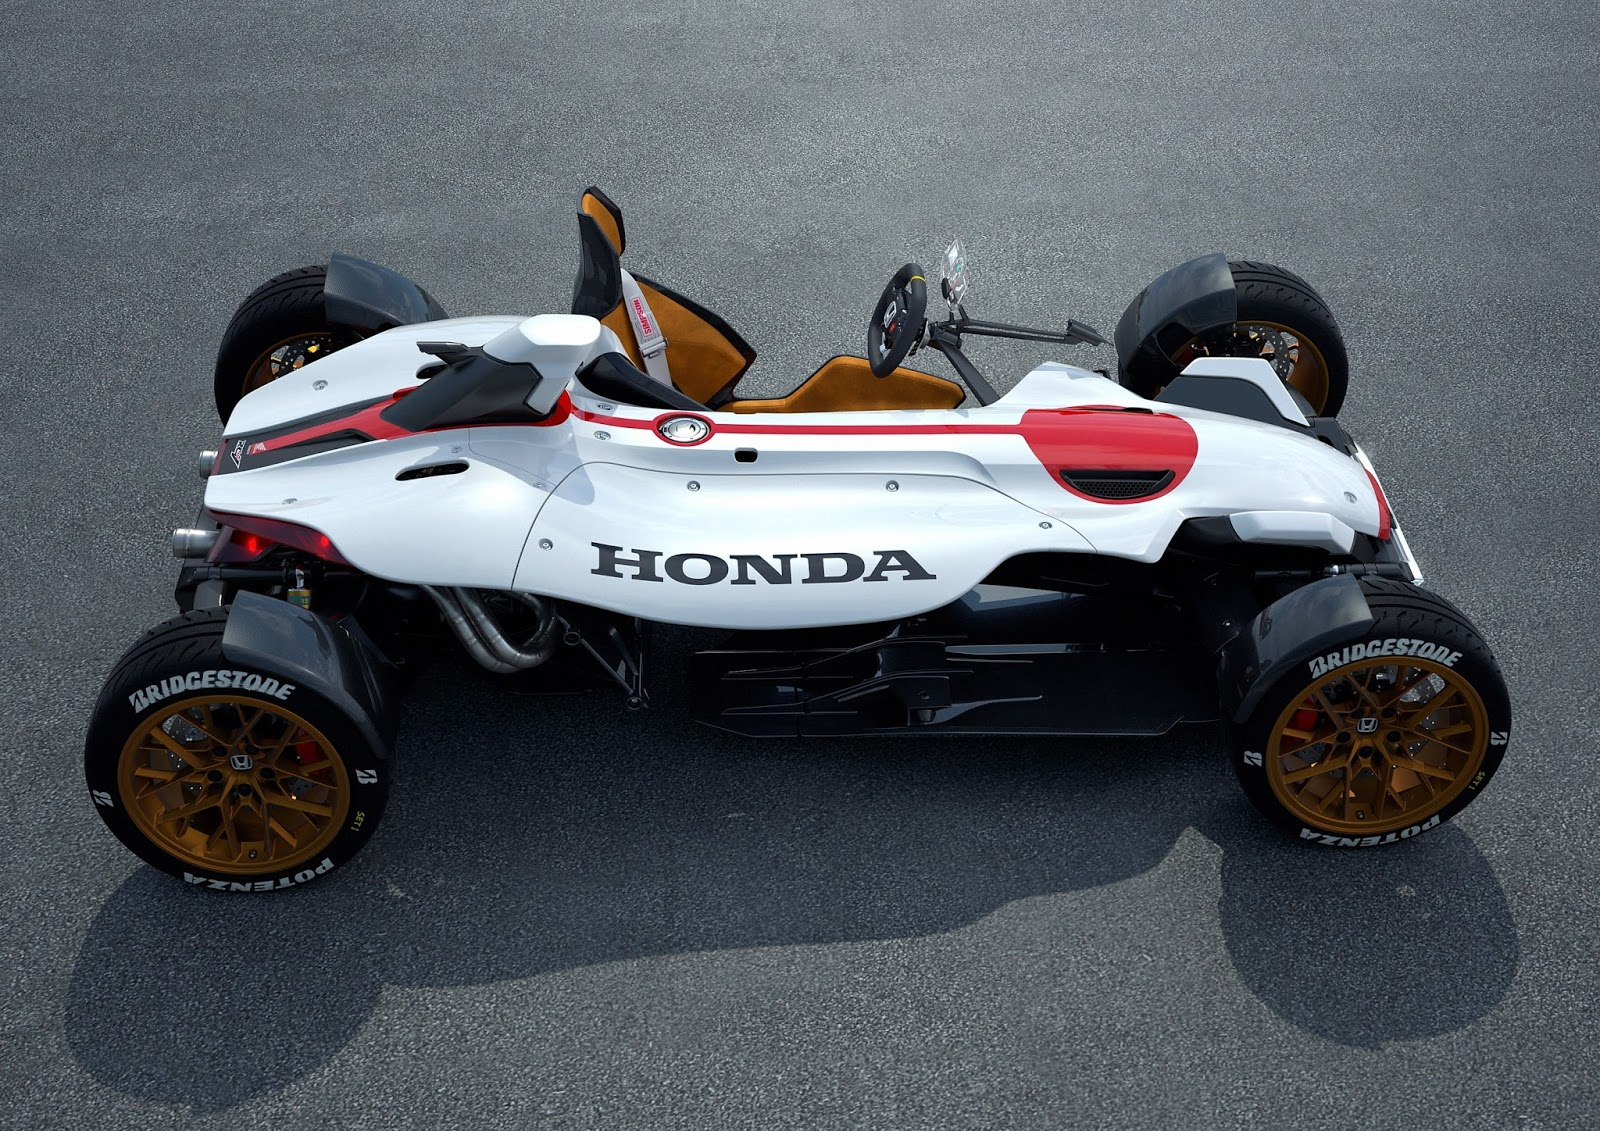 60393 HONDA PROJECT 2 4 POWERED BY RC213V TO DEBUT AT FRANKFURT A COMBINATION OF 1 Αυτοκίνητο ή μοτοσικλέτα; Και τα δυο σε ένα μας λέει η Honda Frankfurt Motor Show, Global Design Project, Honda, Honda design, Honda Project 2&4